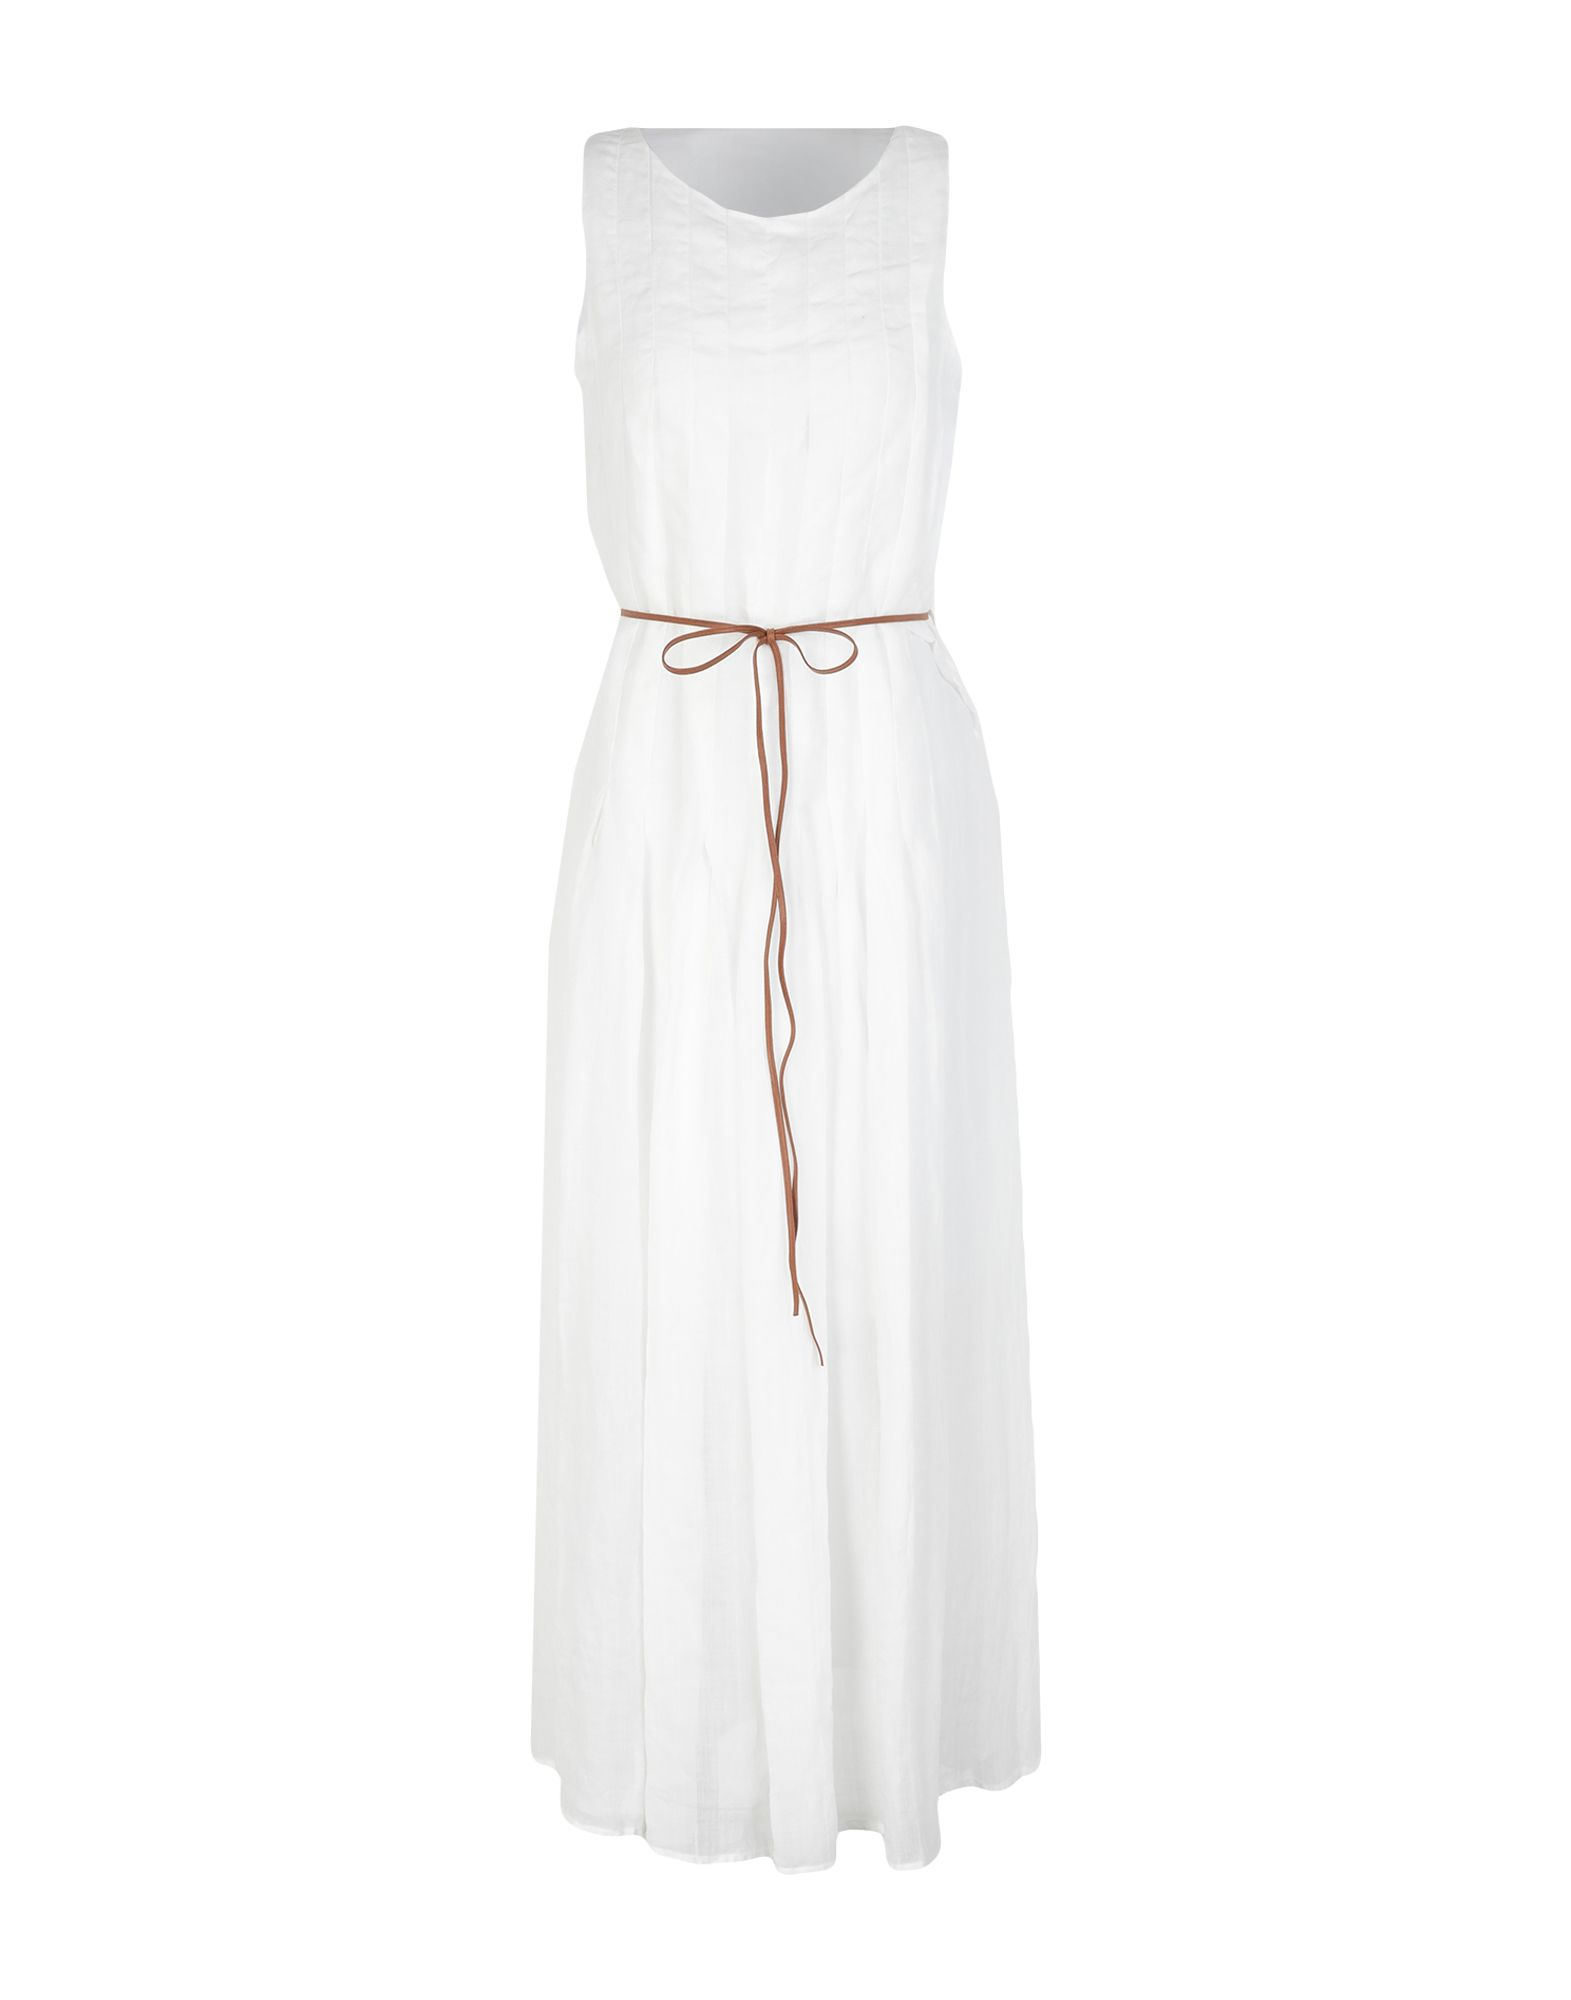 Фото - COLLECTION PRIVĒE? Длинное платье платье oodji collection цвет карамель 24001104 5b 47420 4b00n размер xl 50